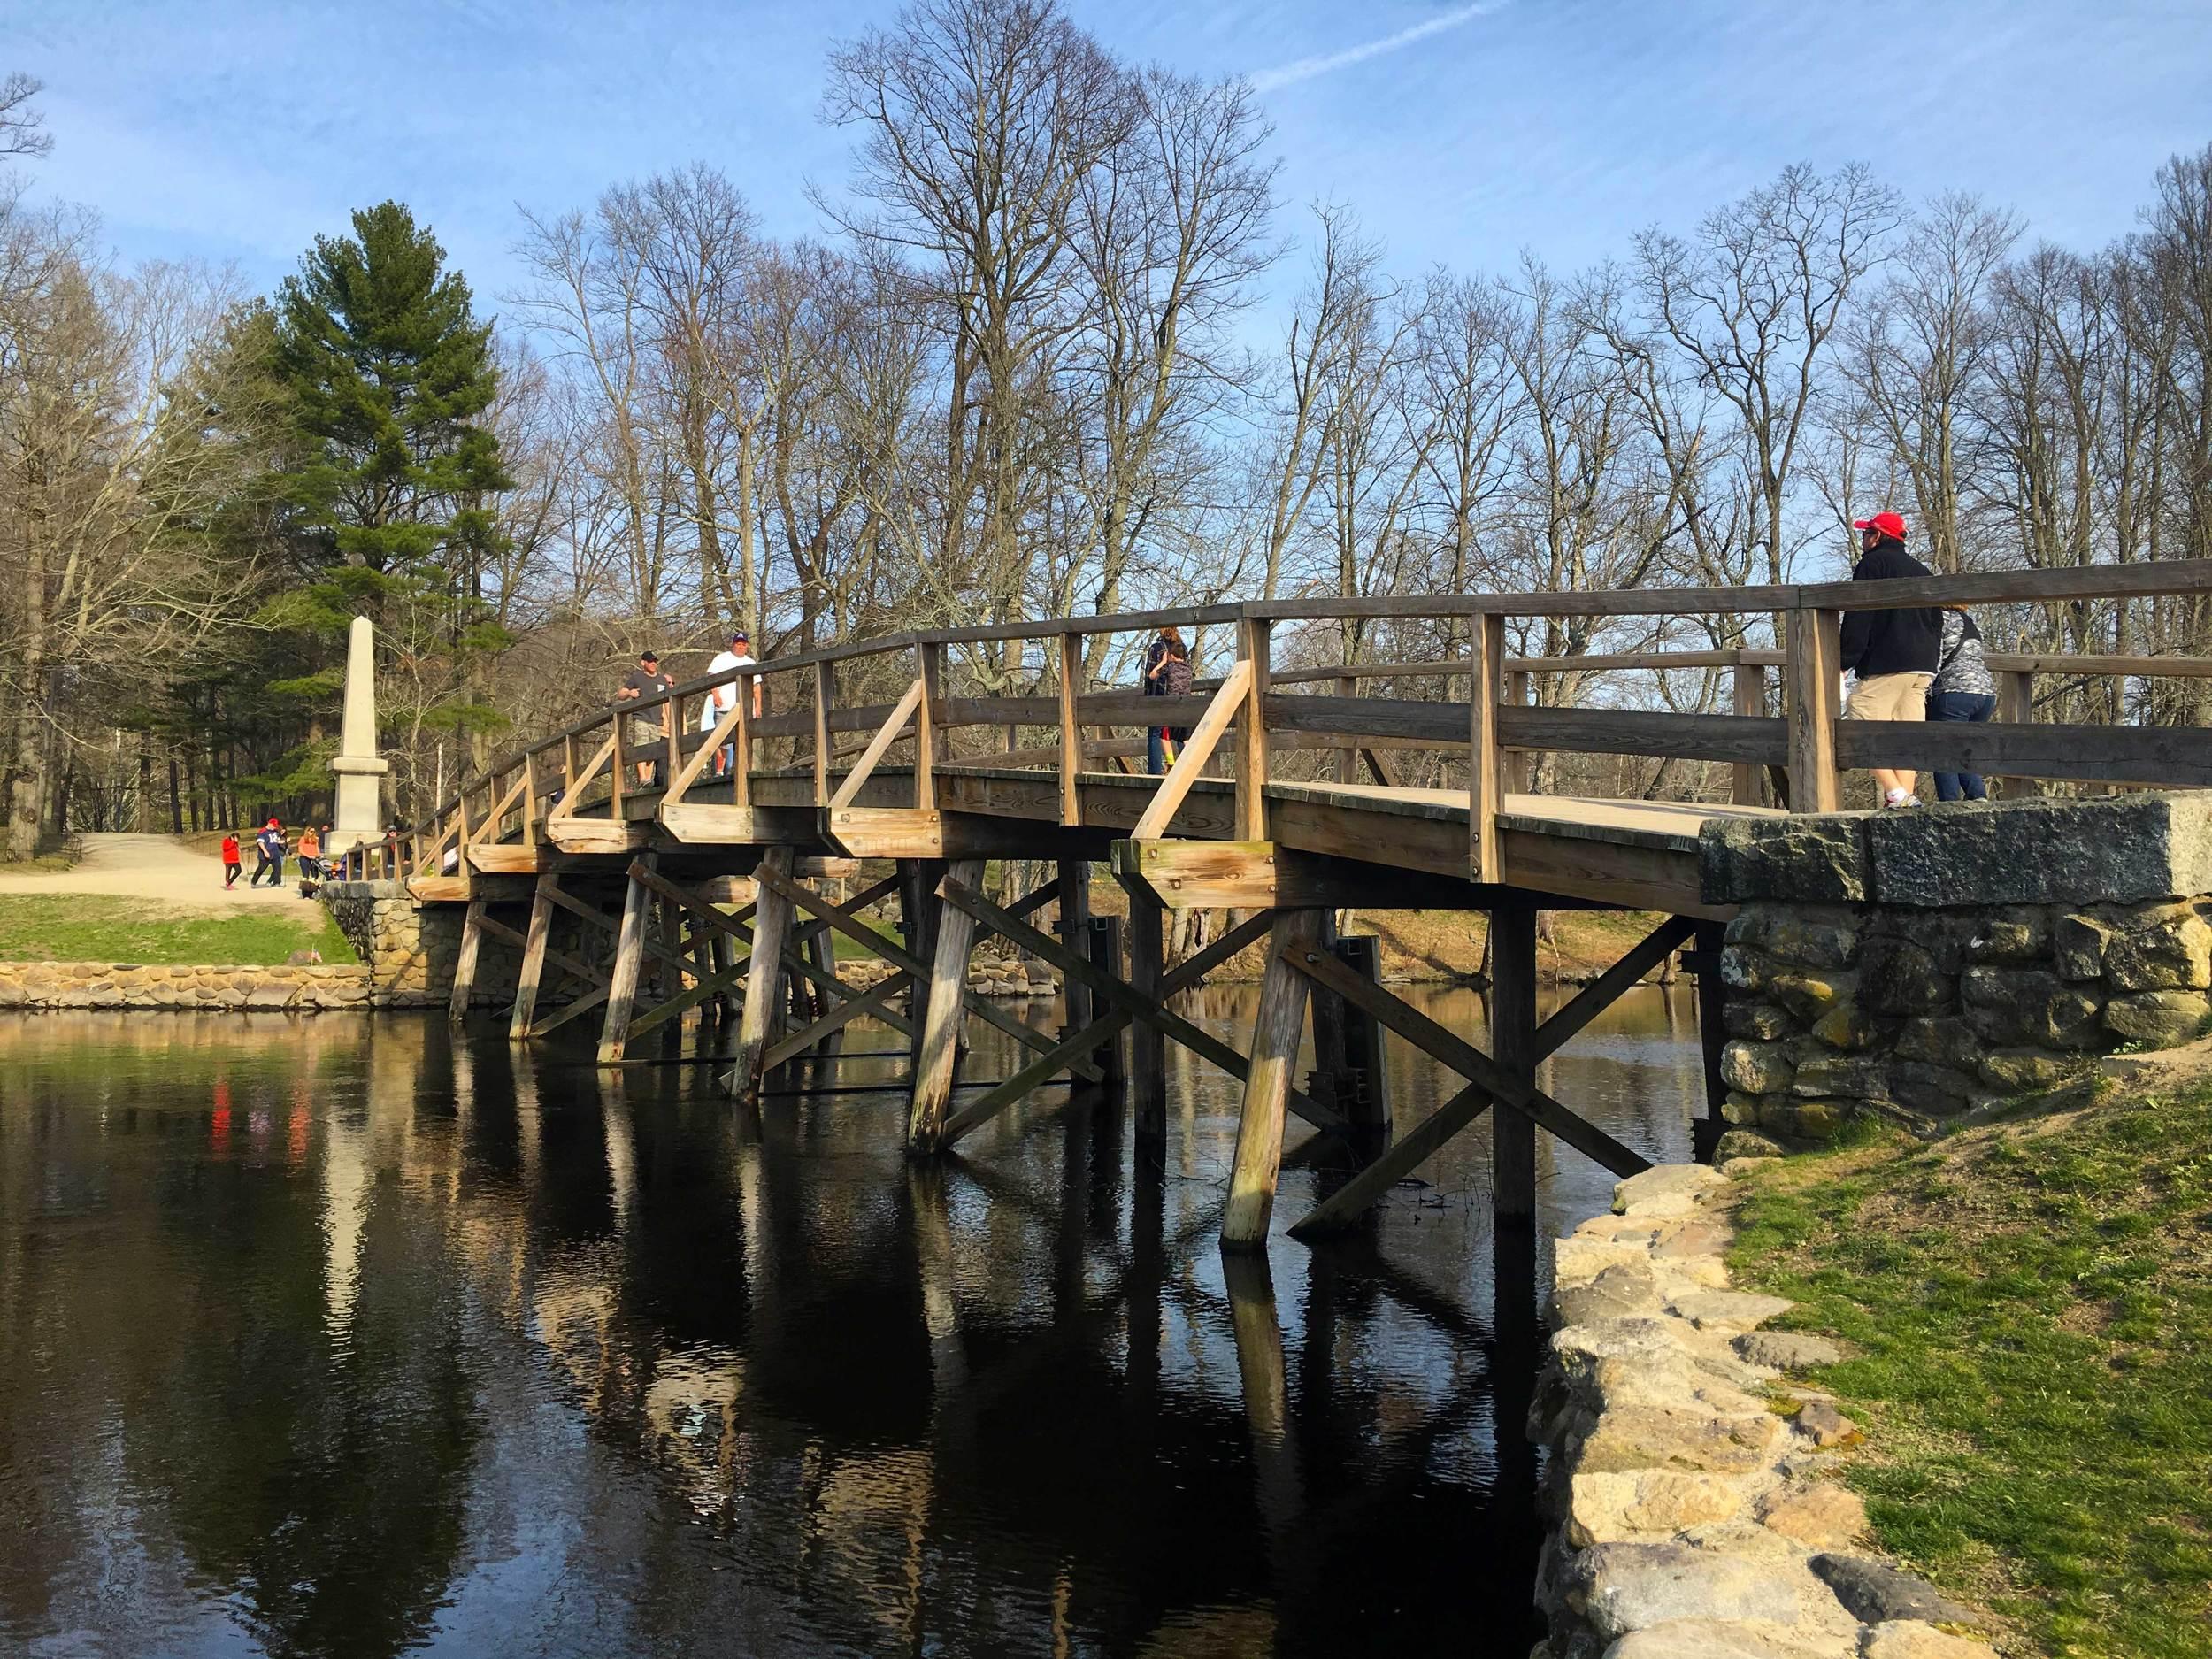 North Bridge, Minute Man National Historic Park, photo by Derek Wright.